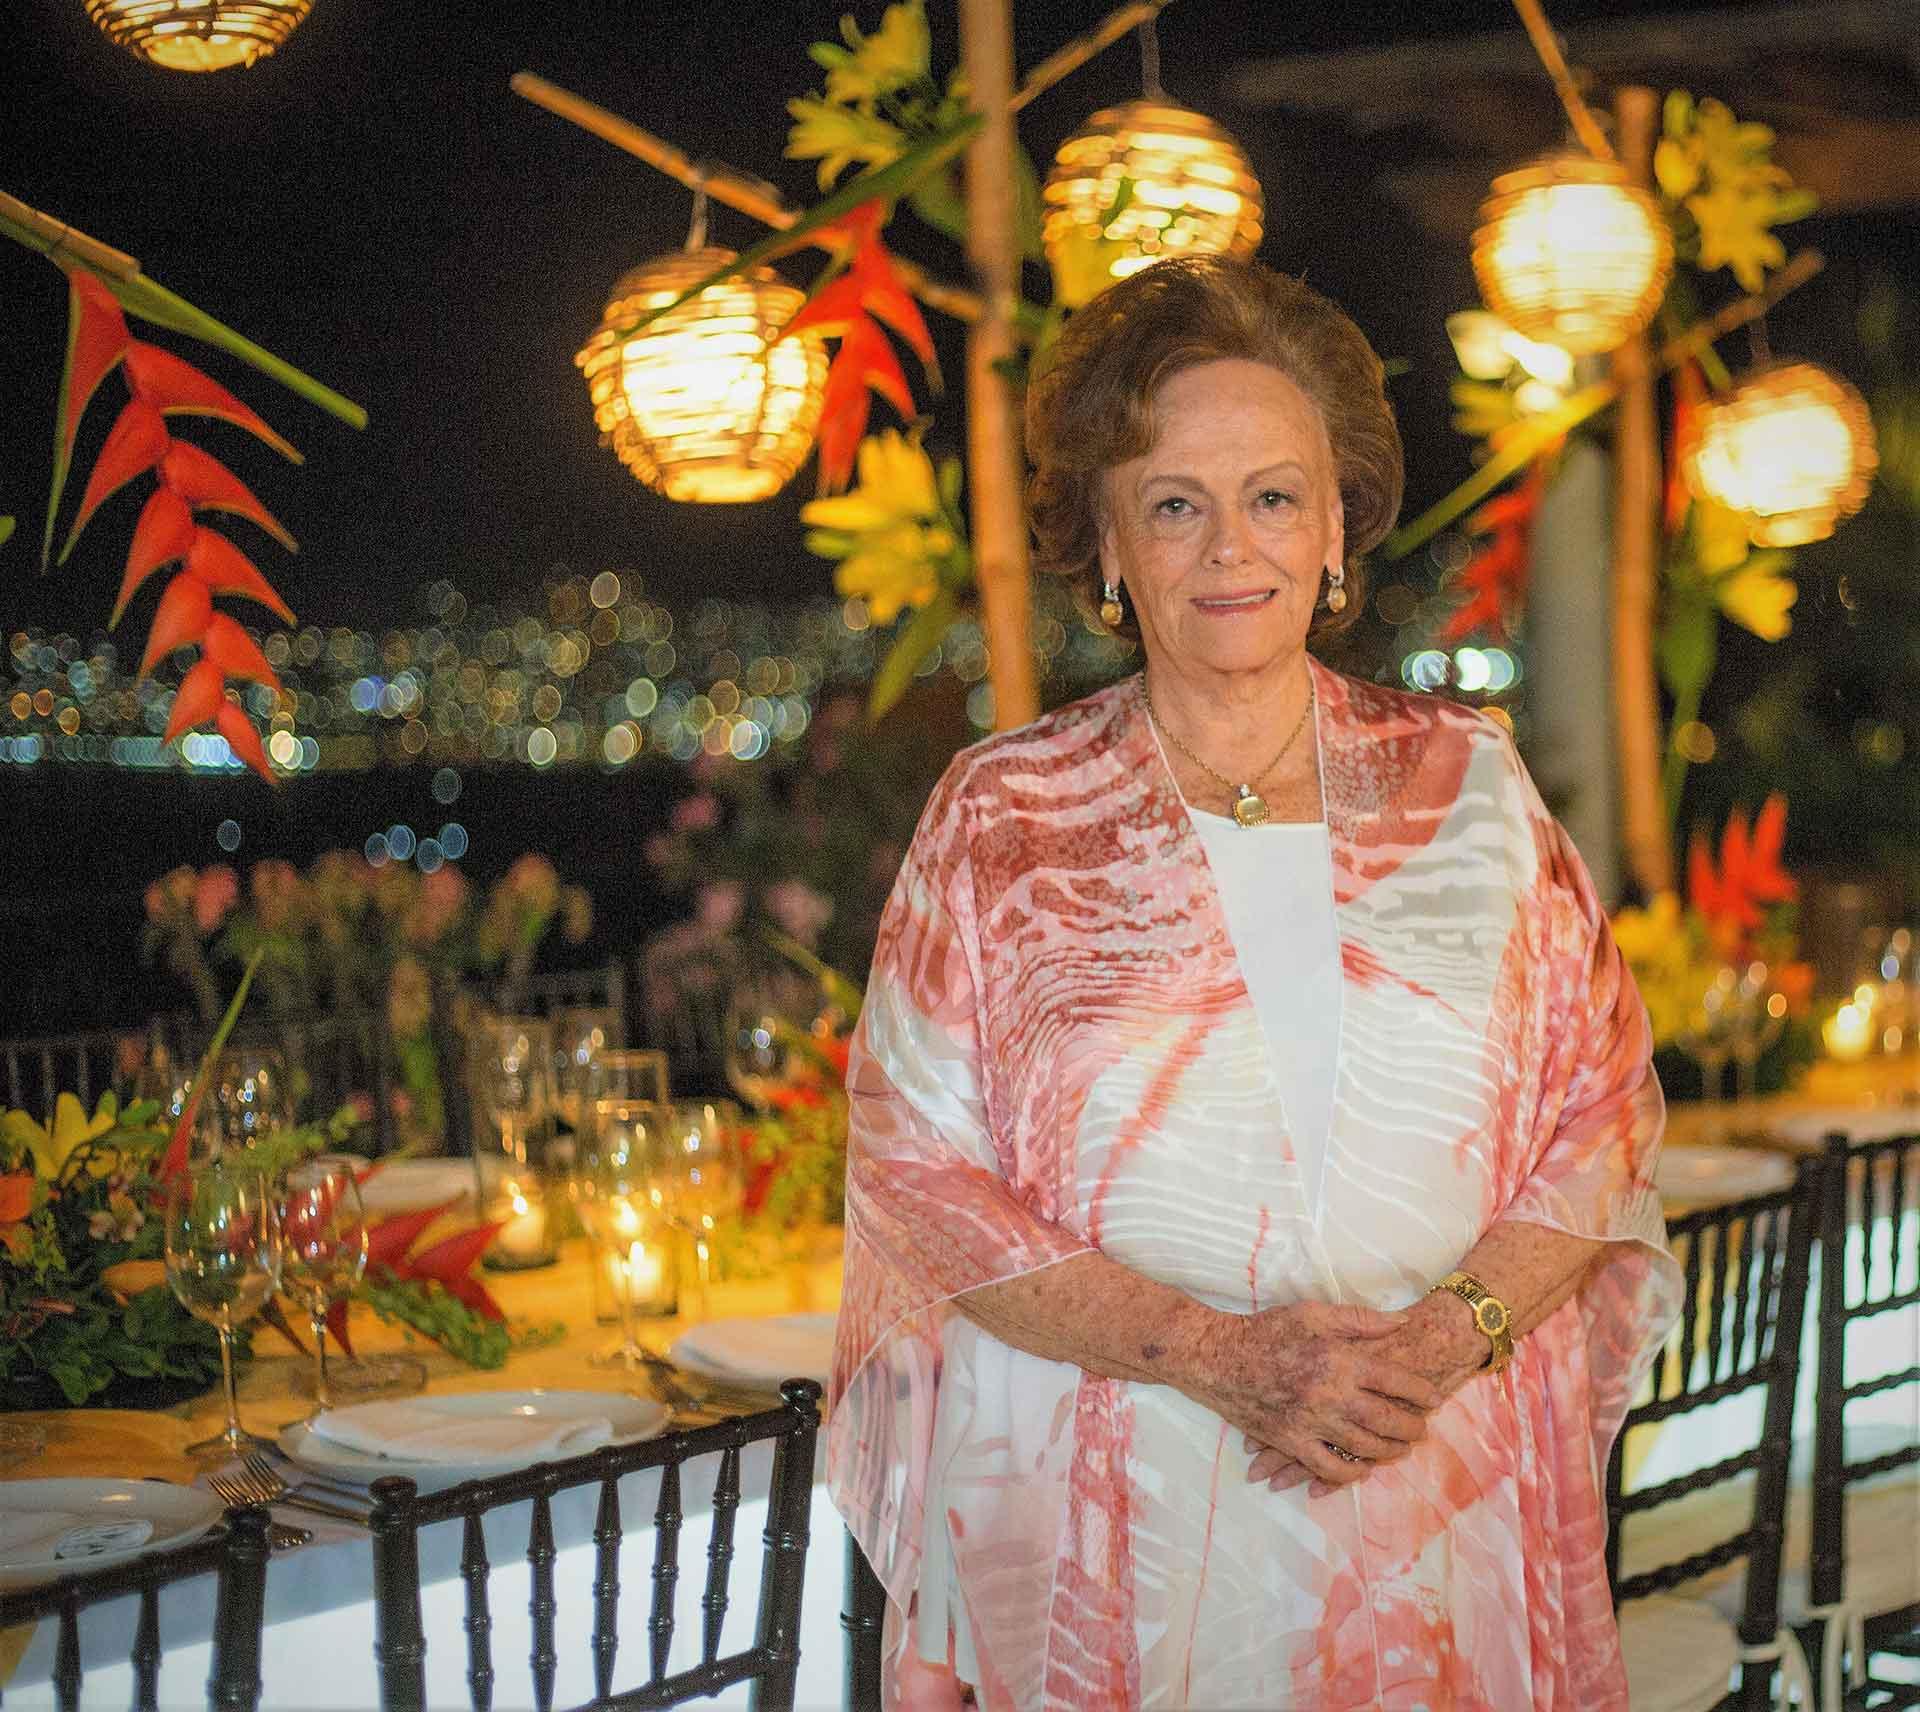 Chef-Susana-Palazuelos-Acapulco